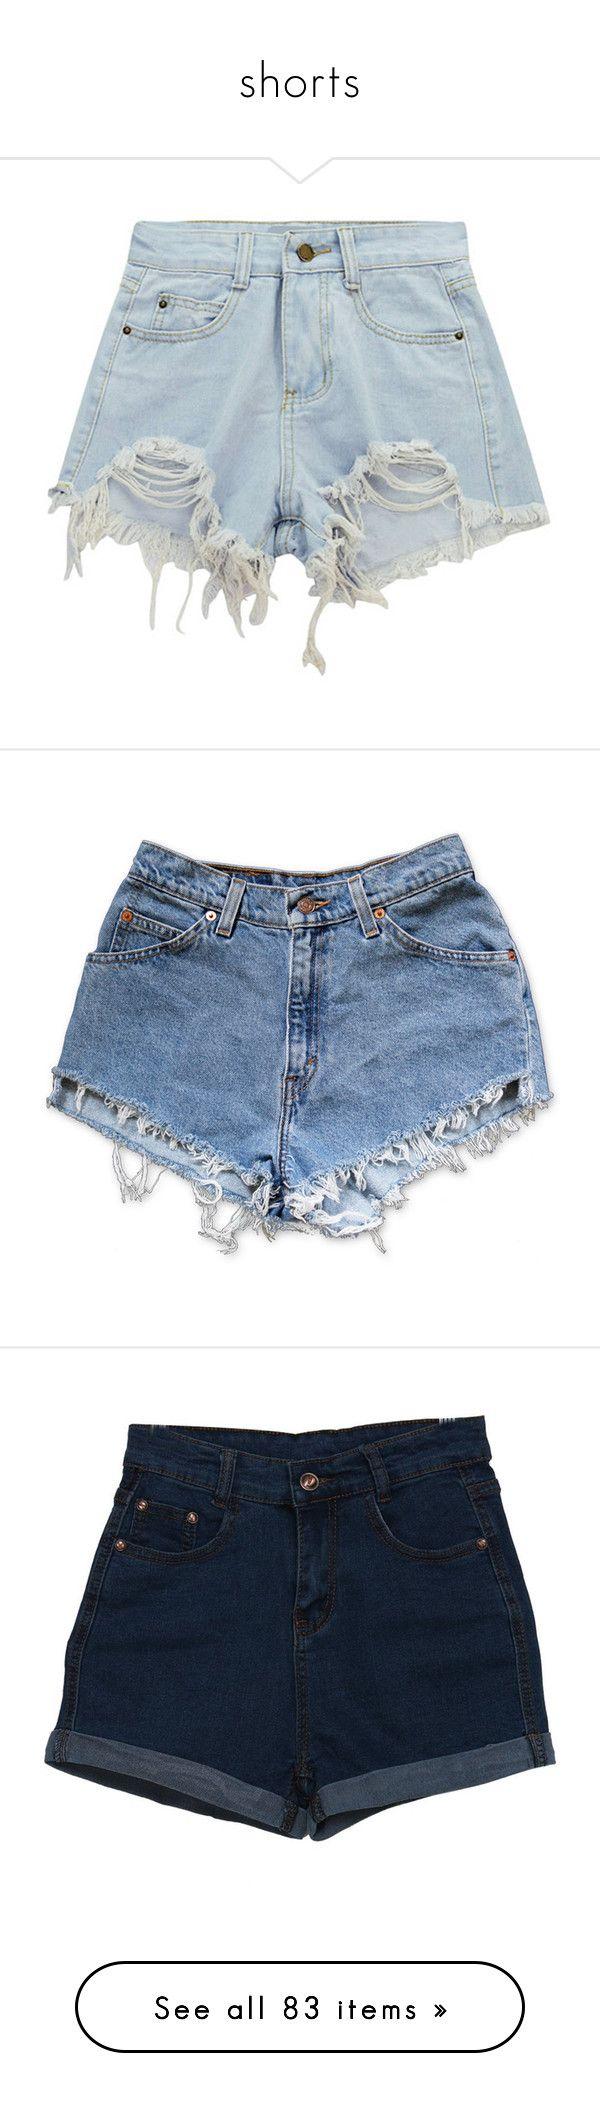 """shorts"" by brigi-bodoki ❤ liked on Polyvore featuring shorts, bottoms, short, short shorts, high-rise shorts, high waisted ripped shorts, high waisted destroyed shorts, ripped shorts, denim cut-off shorts and short jean shorts"